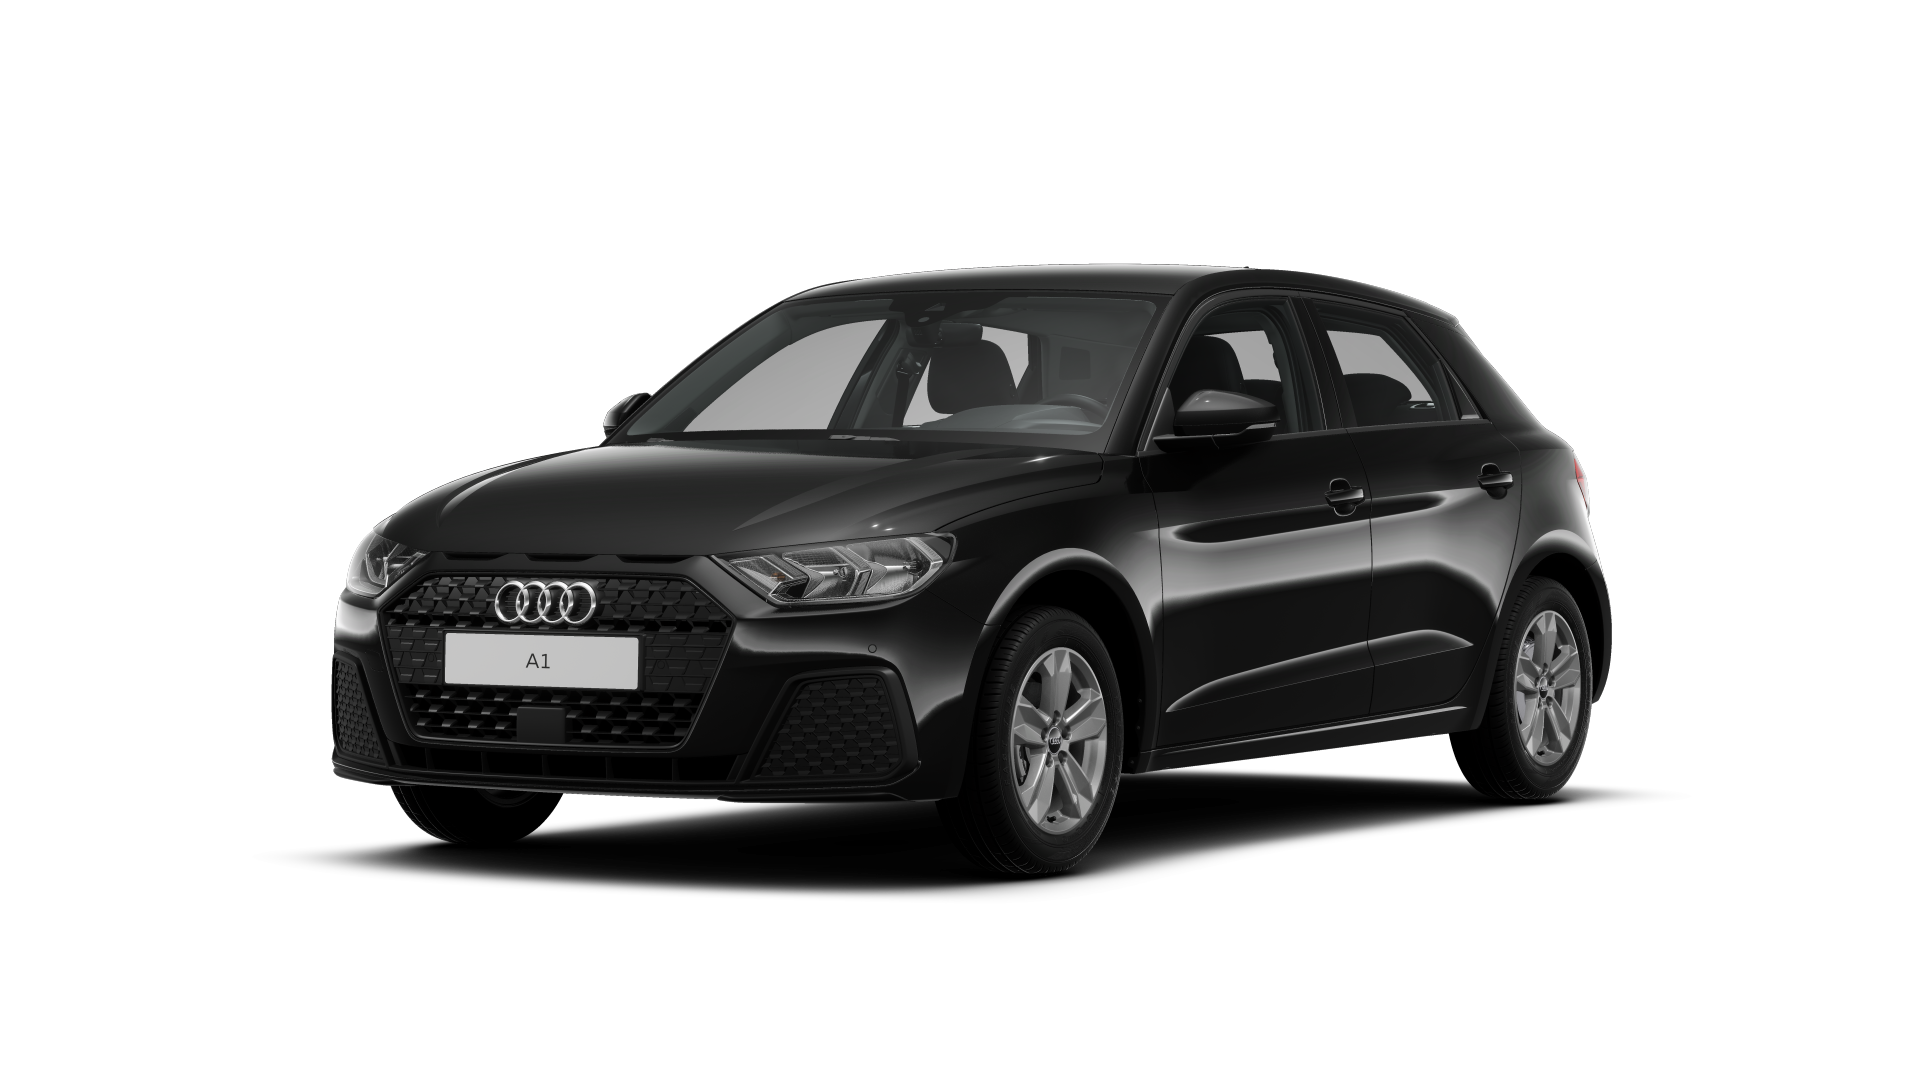 Audi A1 Sportback Business Edition 25 TFSI  70(95) kW(pk) S tronic